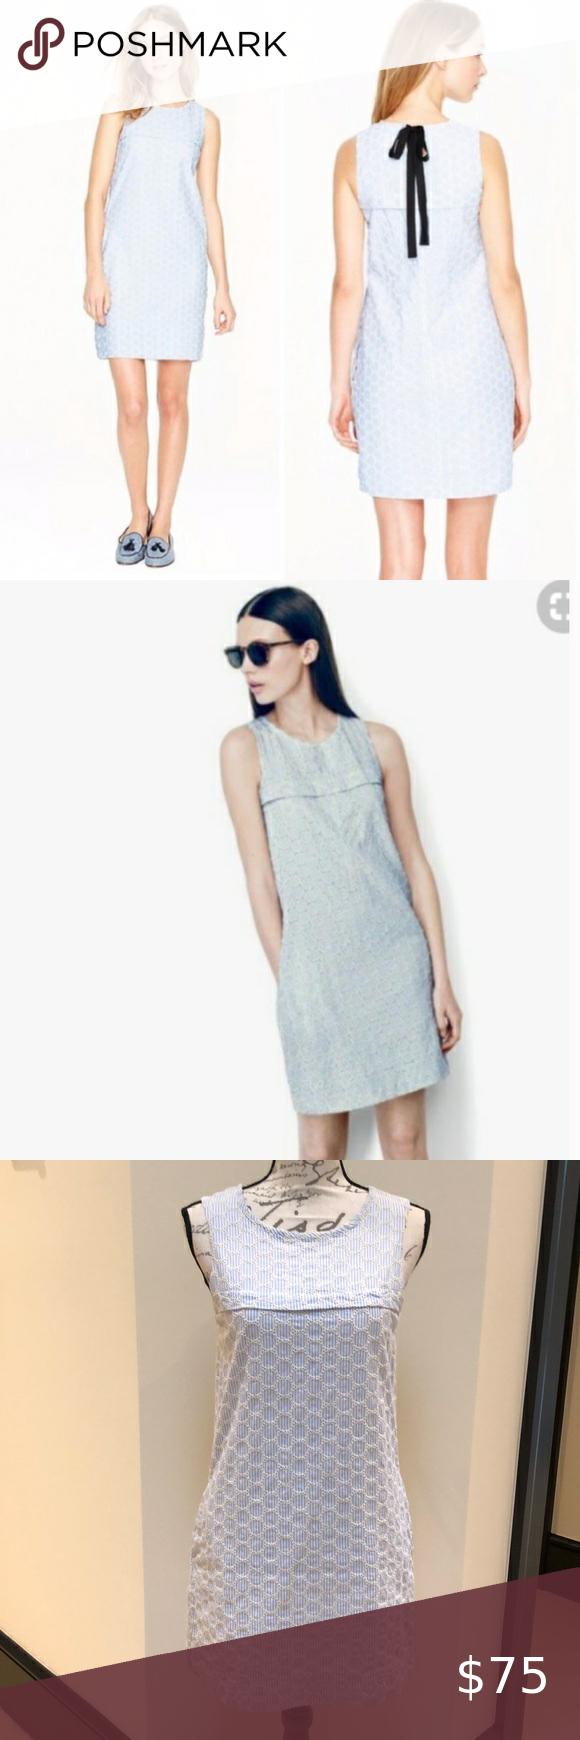 New J Crew Seersucker Eyelet Shift Dress Shift Dress Dresses Clothes Design [ 1740 x 580 Pixel ]